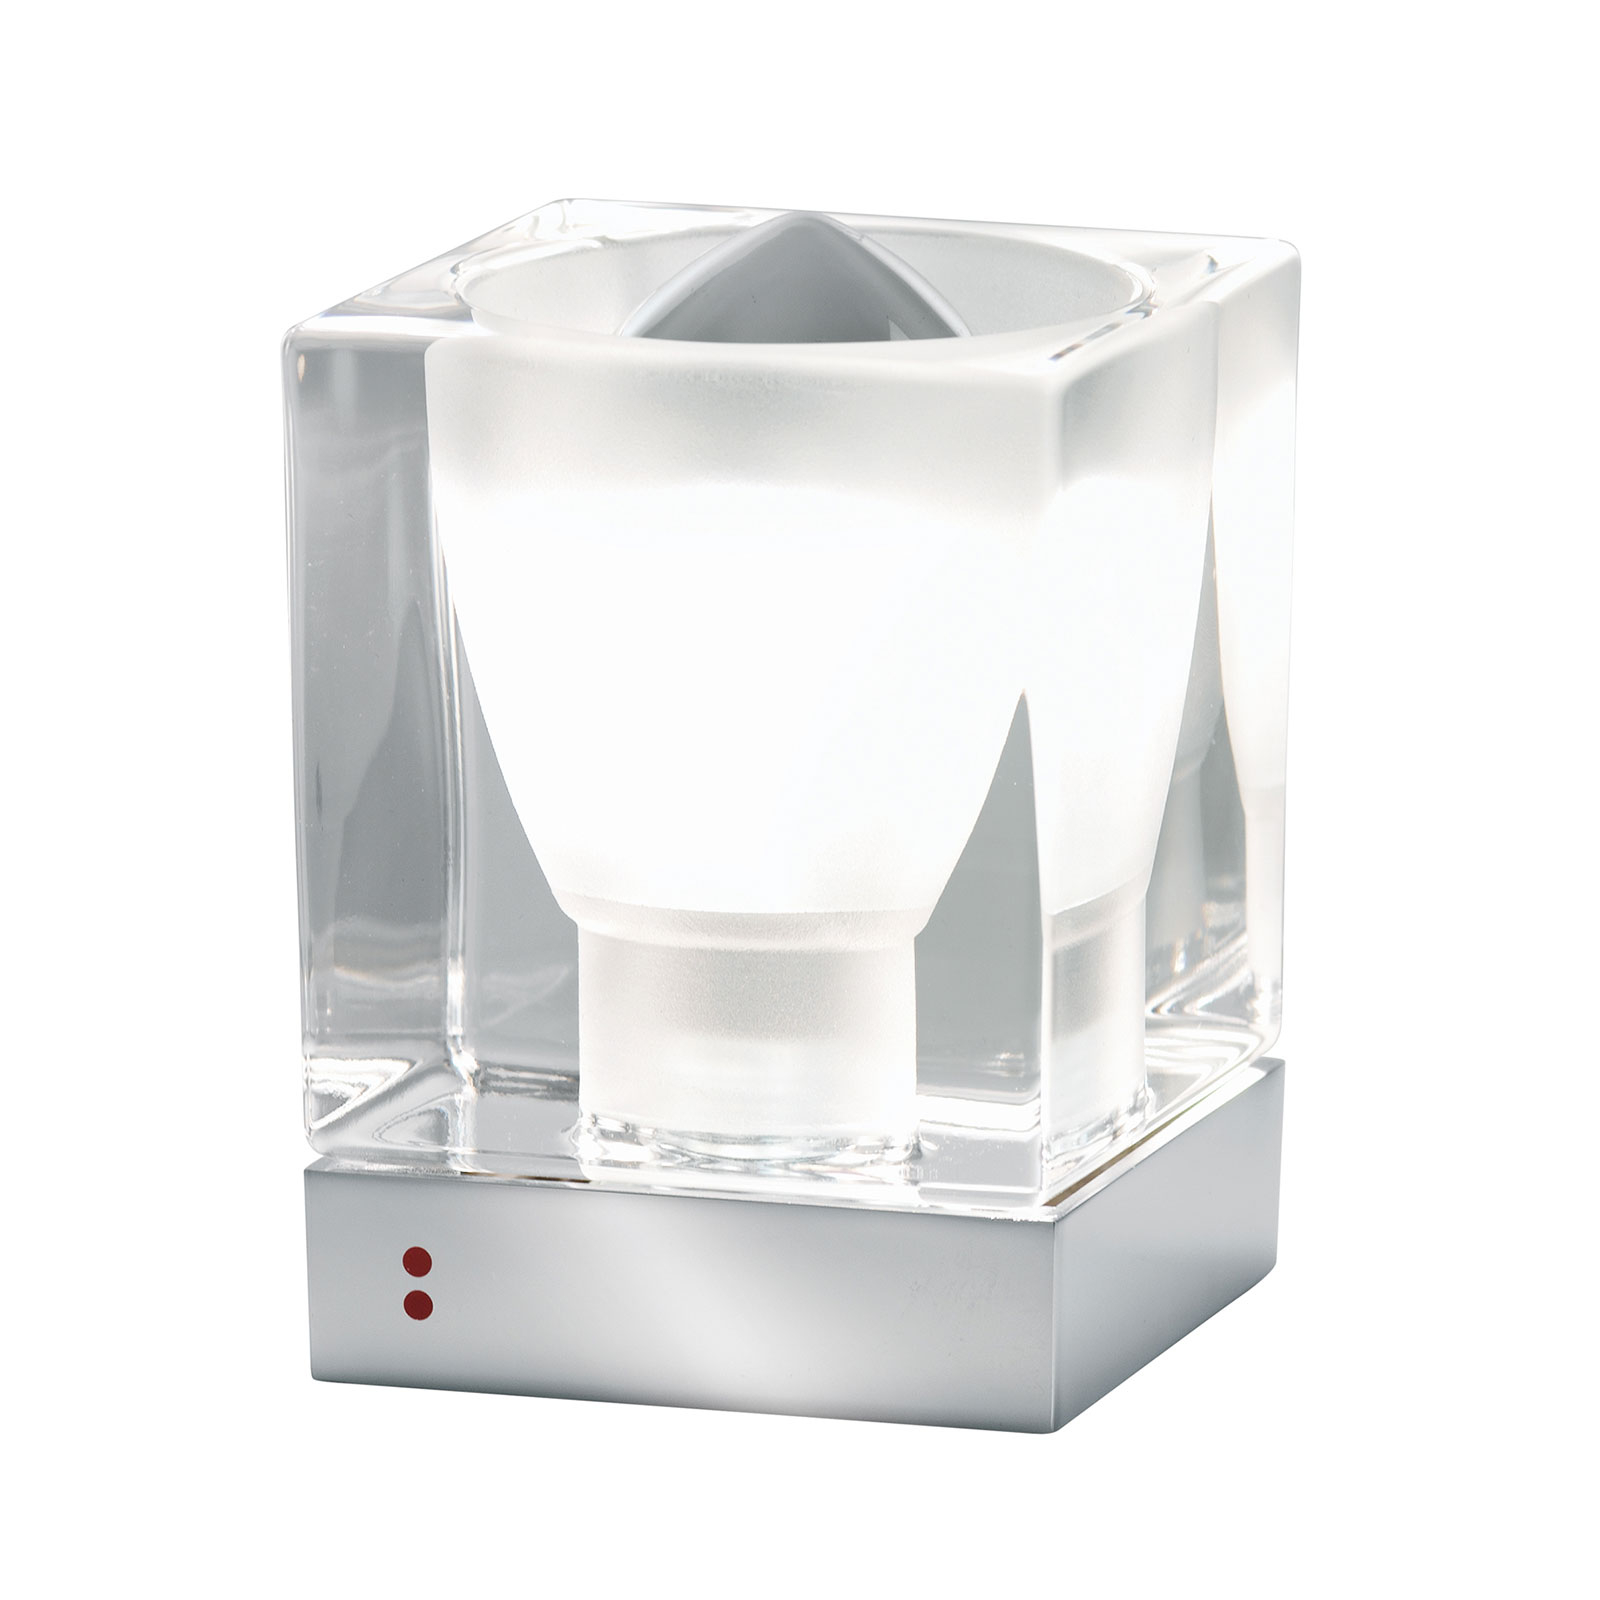 Fabbian Cubetto lampe à poser E14 chromée/transp.